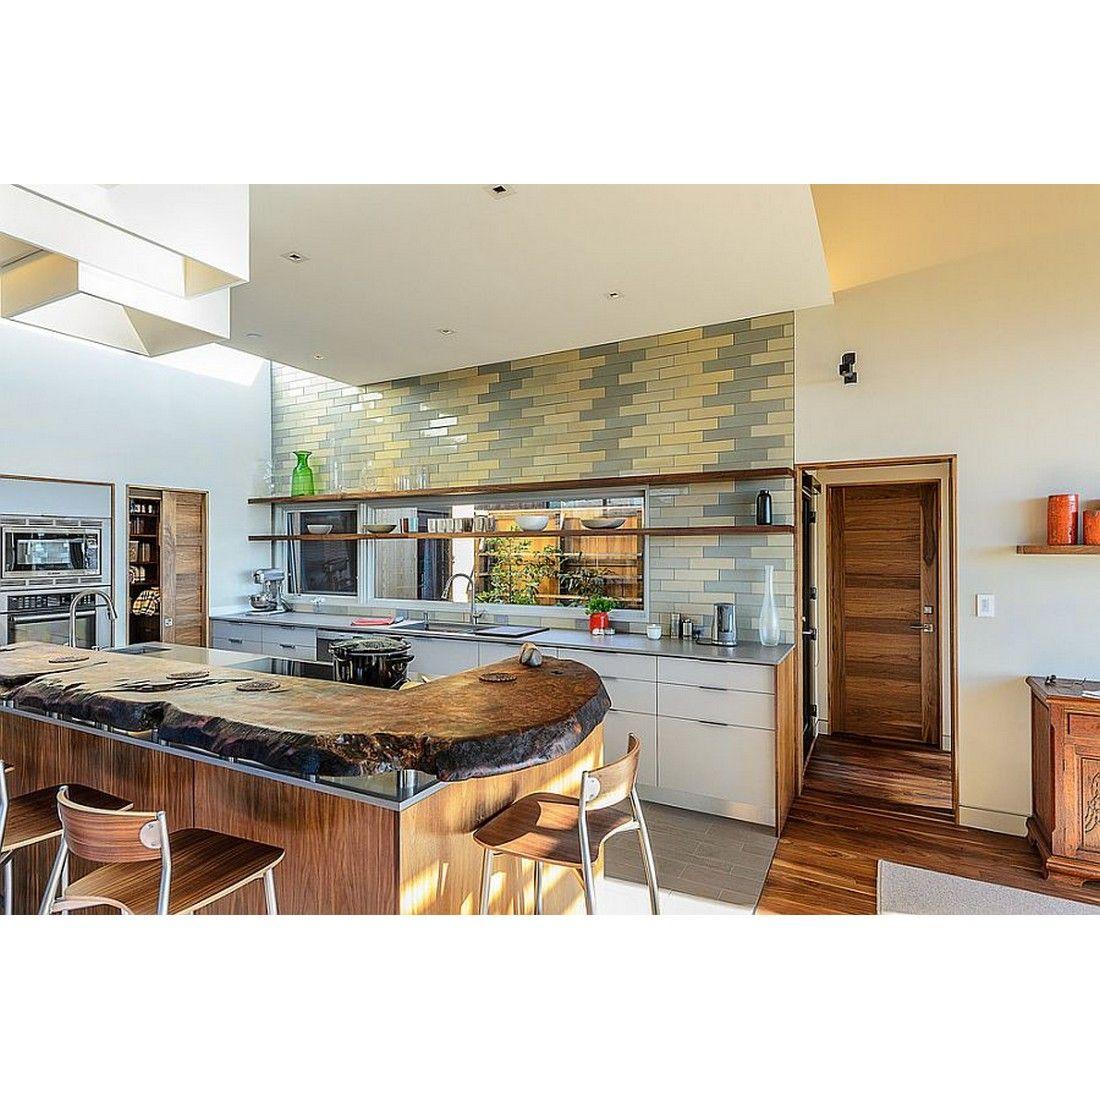 - Midcentury Kitchen With Gray And Yellow Backsplash Tile, Yay Or